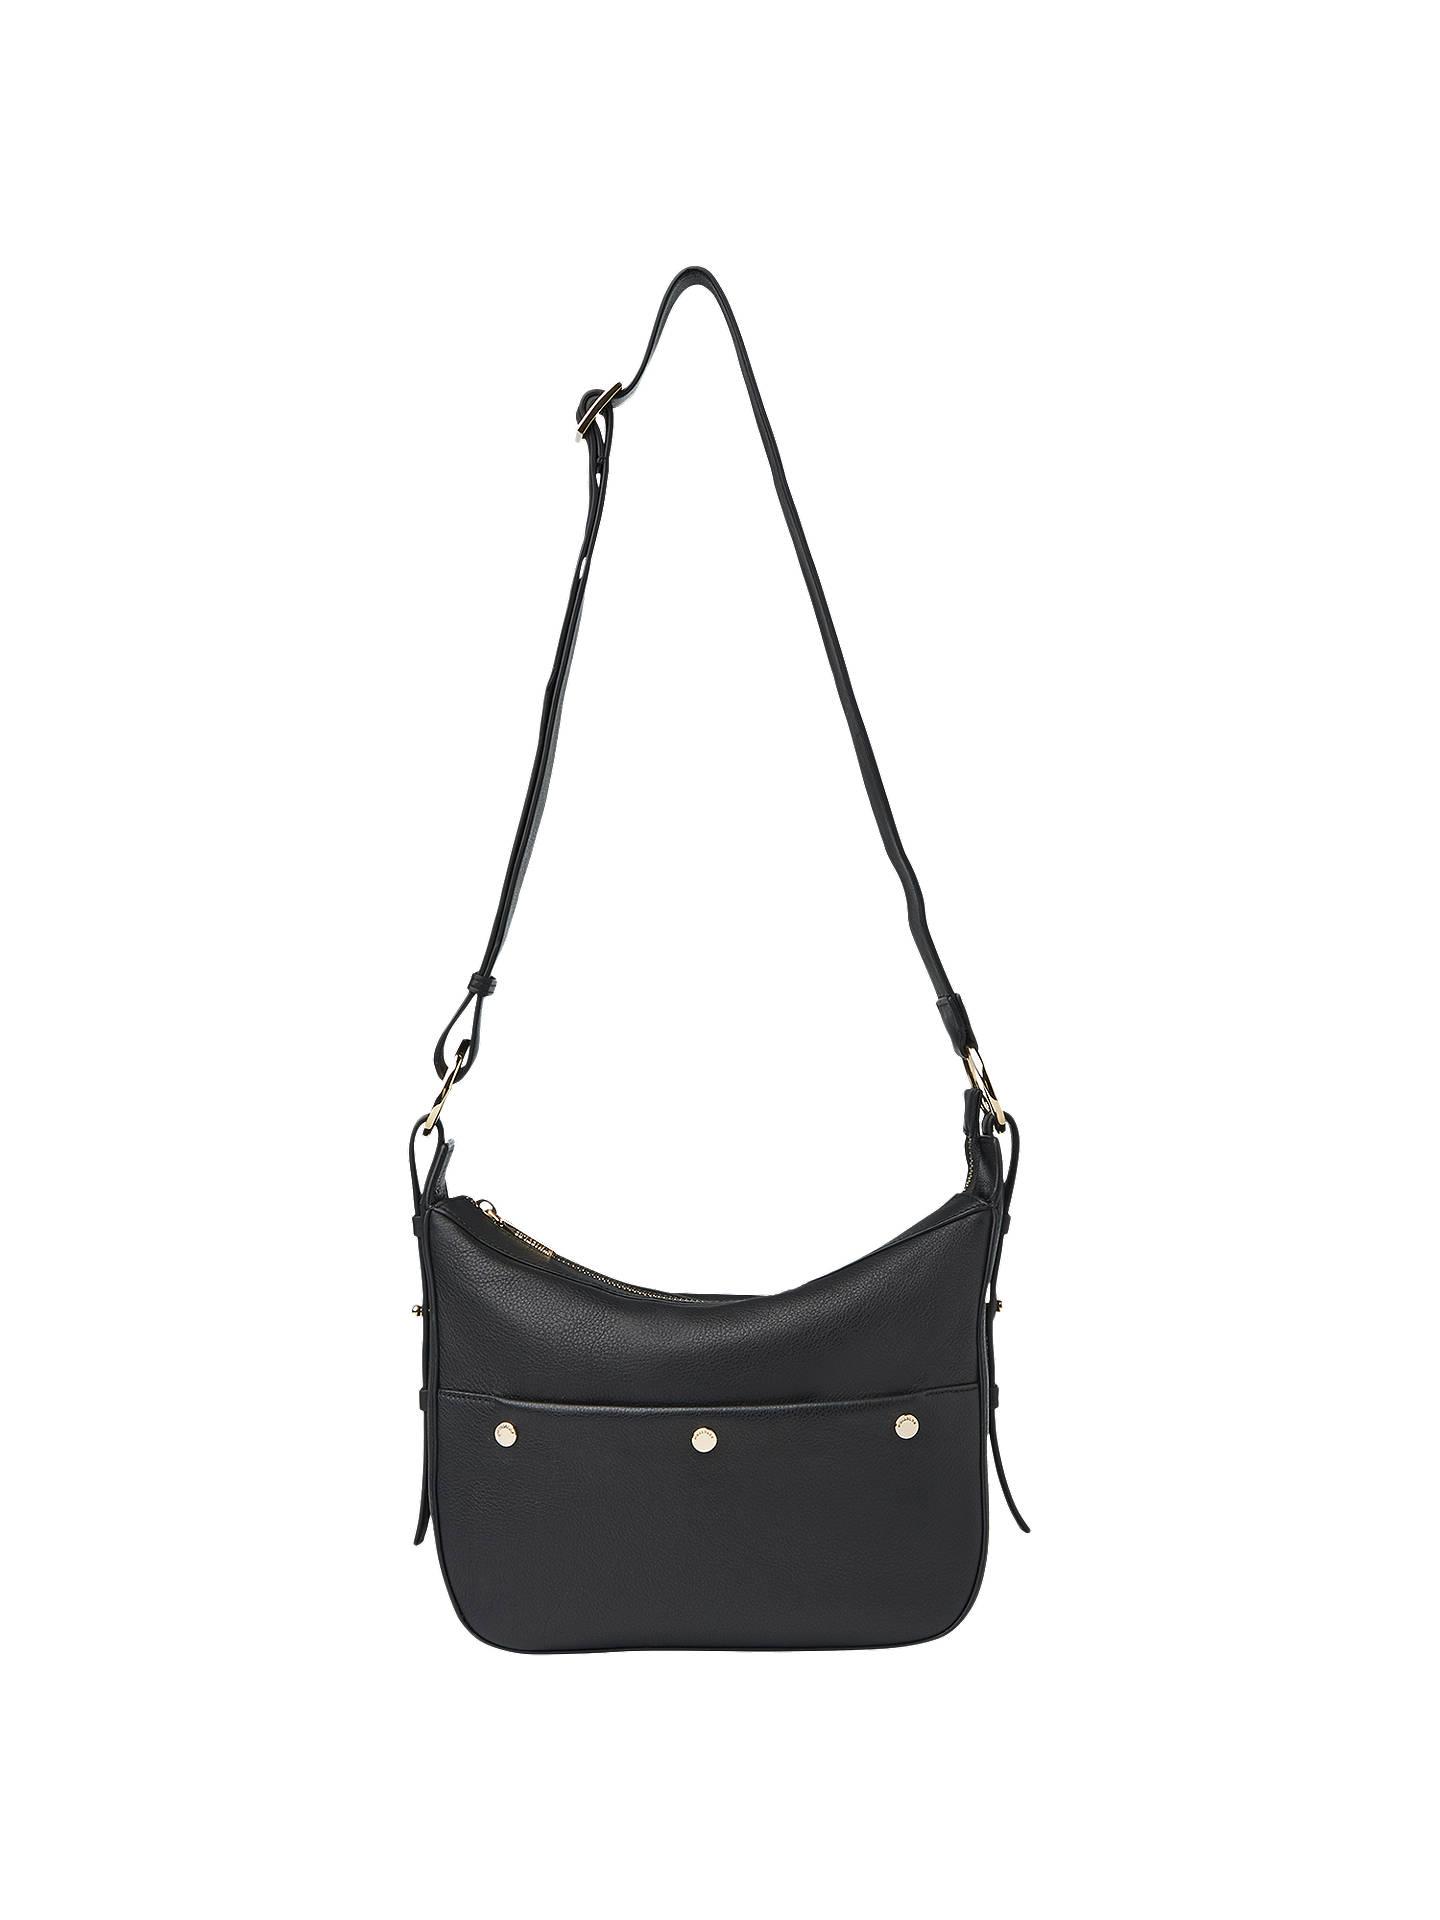 BuyWhistles Arlo Leather Triple Stud Shoulder Bag 4cc1117f9a80d